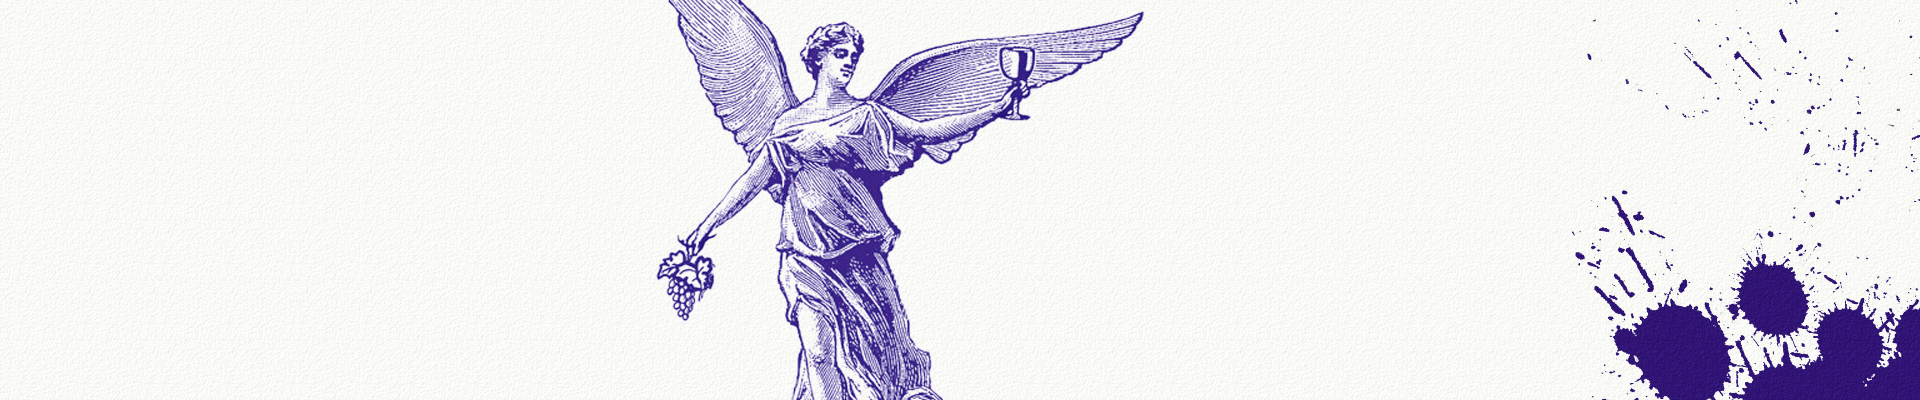 PURPLE ANGEL RECEIVE 99 OF 100 POINTS